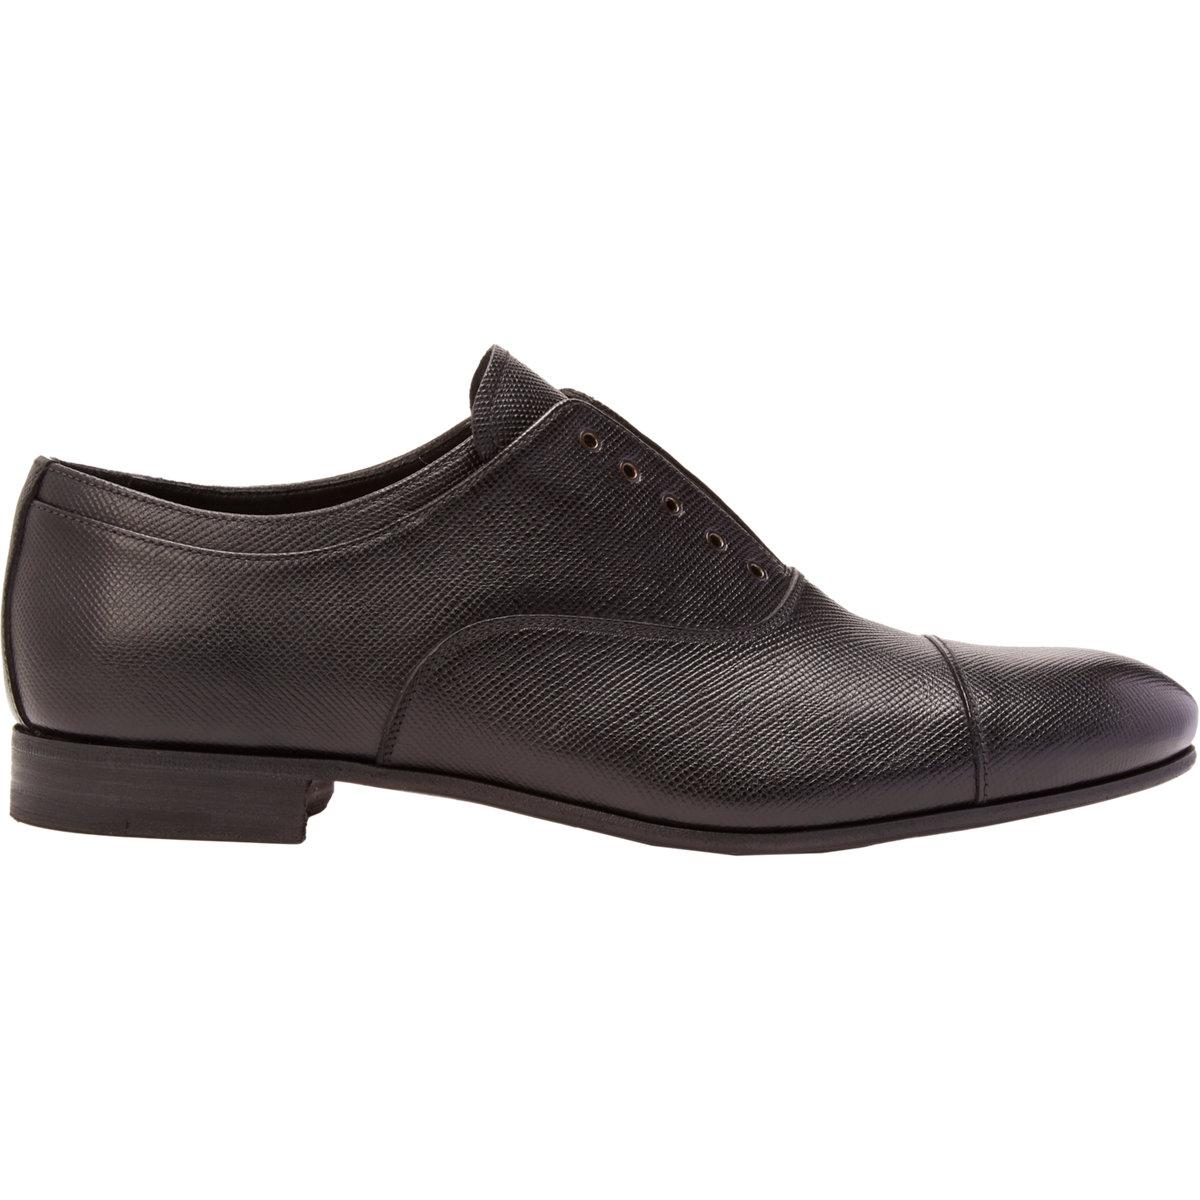 Prada Black Clean Oxfords buy cheap fashion Style cheap sale Manchester cheap sale manchester great sale UnMsYbhdj